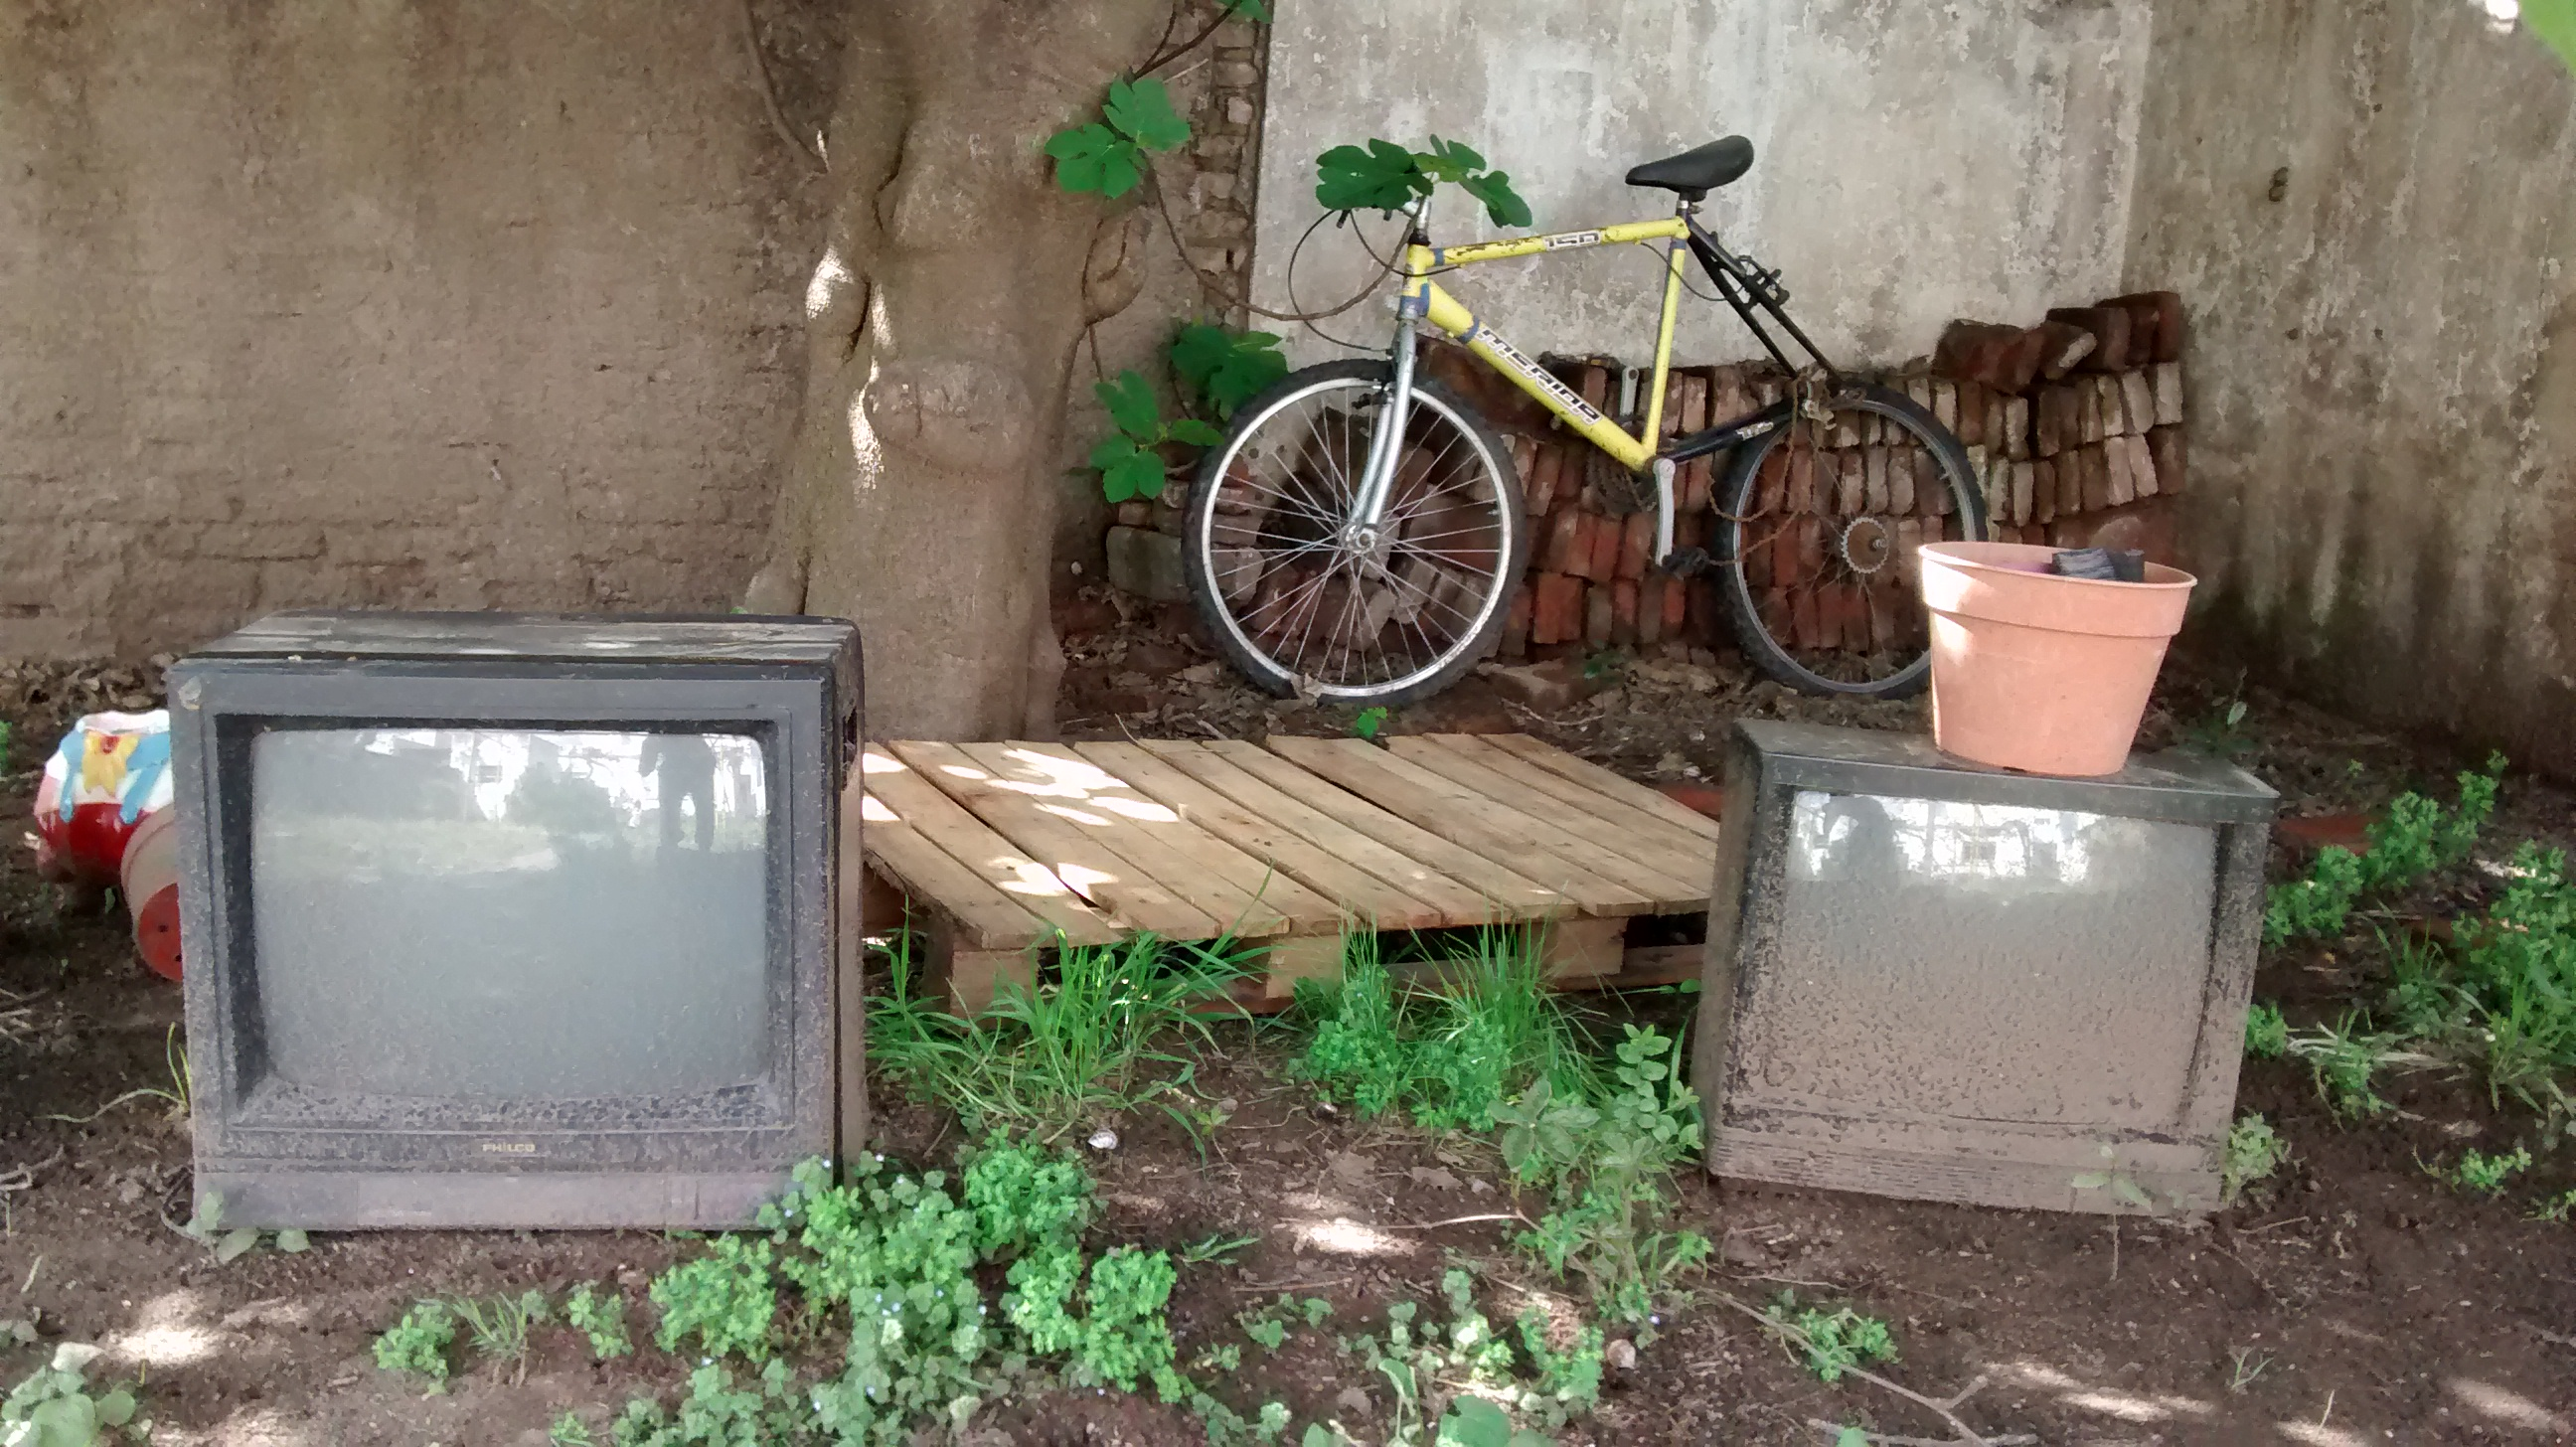 BA 228 - Bike and tvs